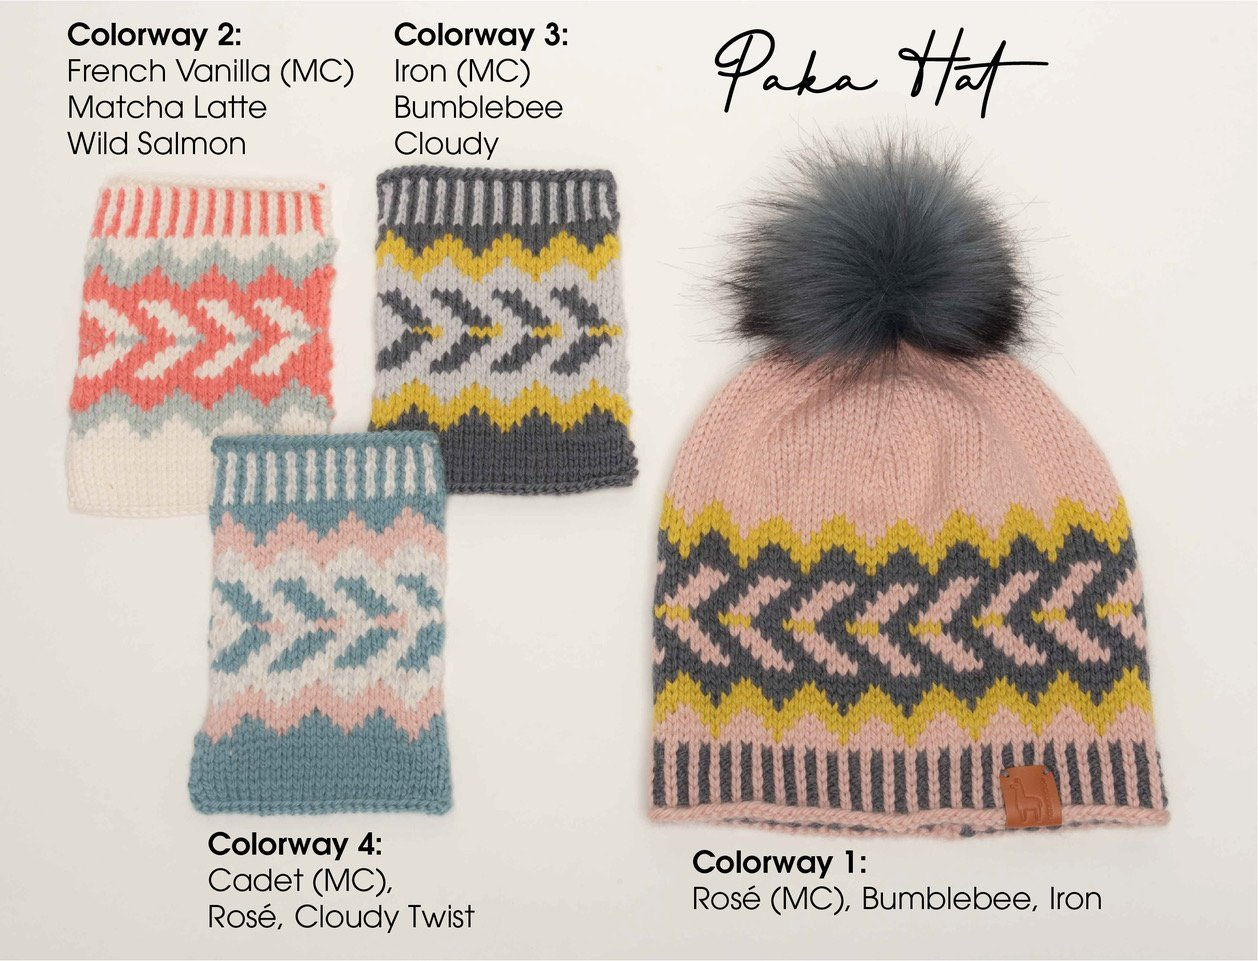 Ikigai Paka Hat Kit Without Pom Pom - Color Way 1- Rose